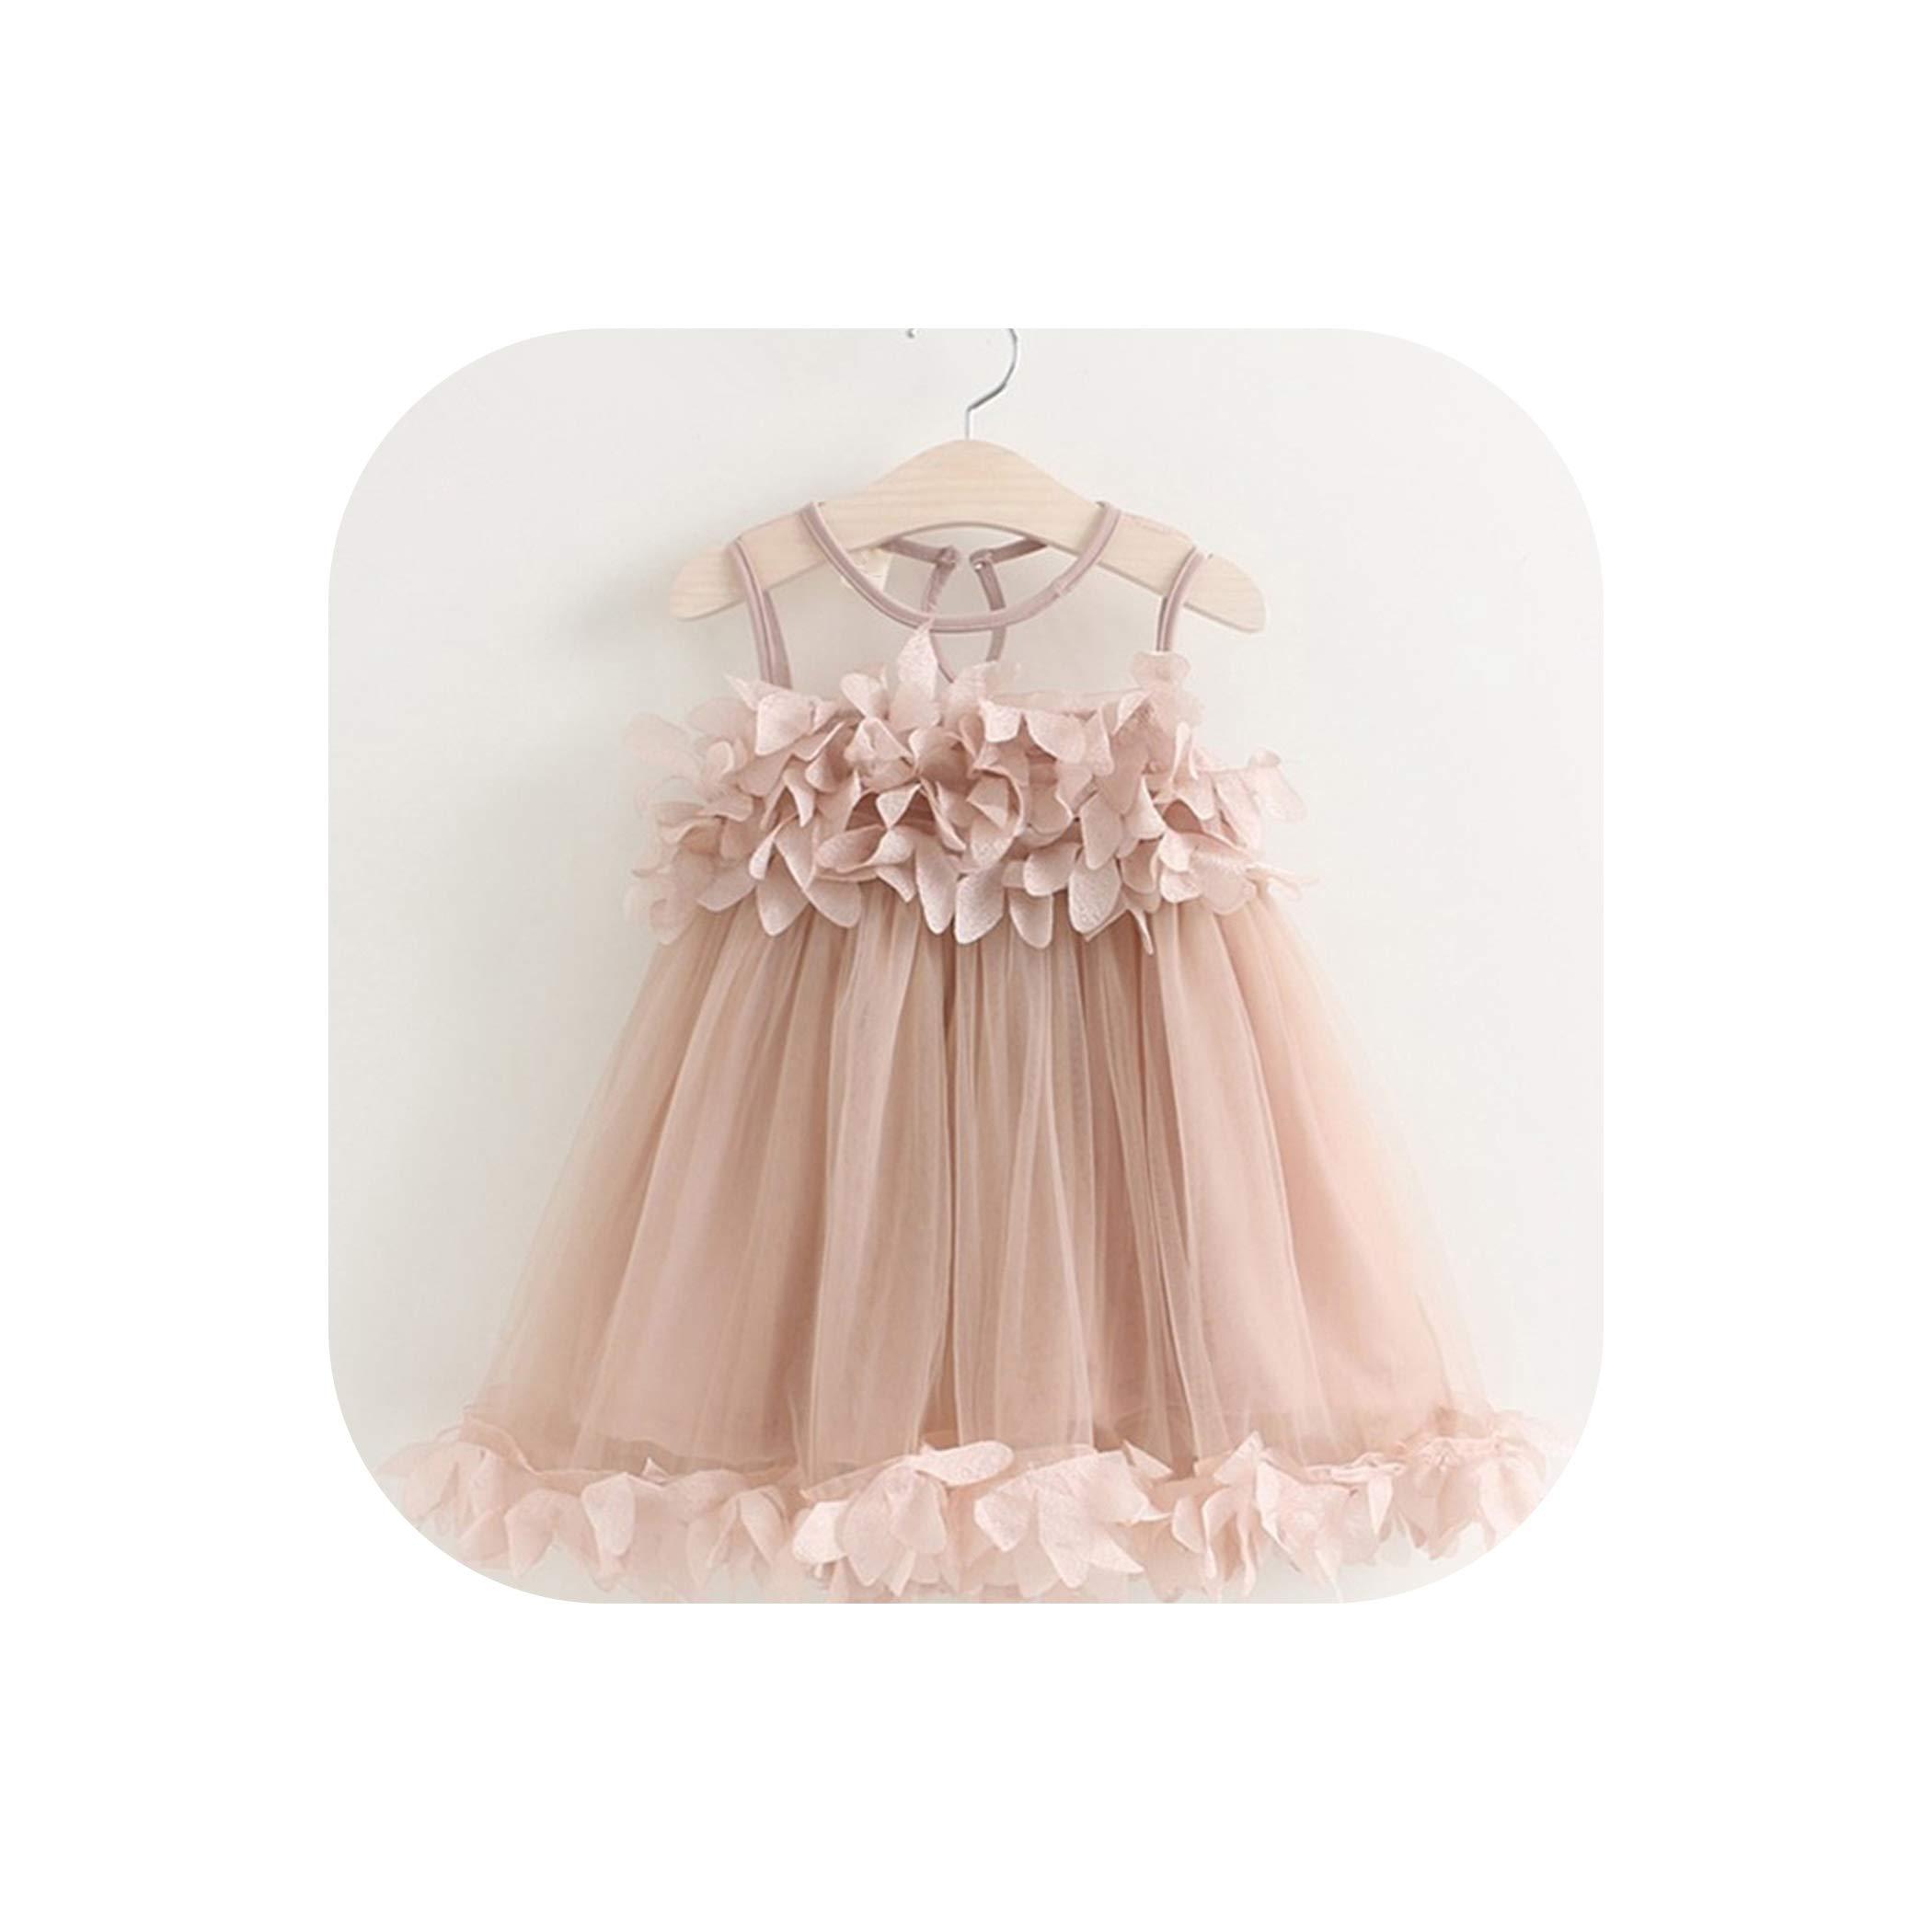 Baby Girl Dress Toddler Kids Party Dress Summer Childrens Clothing Girls Gauze Pink Applique Petal Dress,Pink,4T